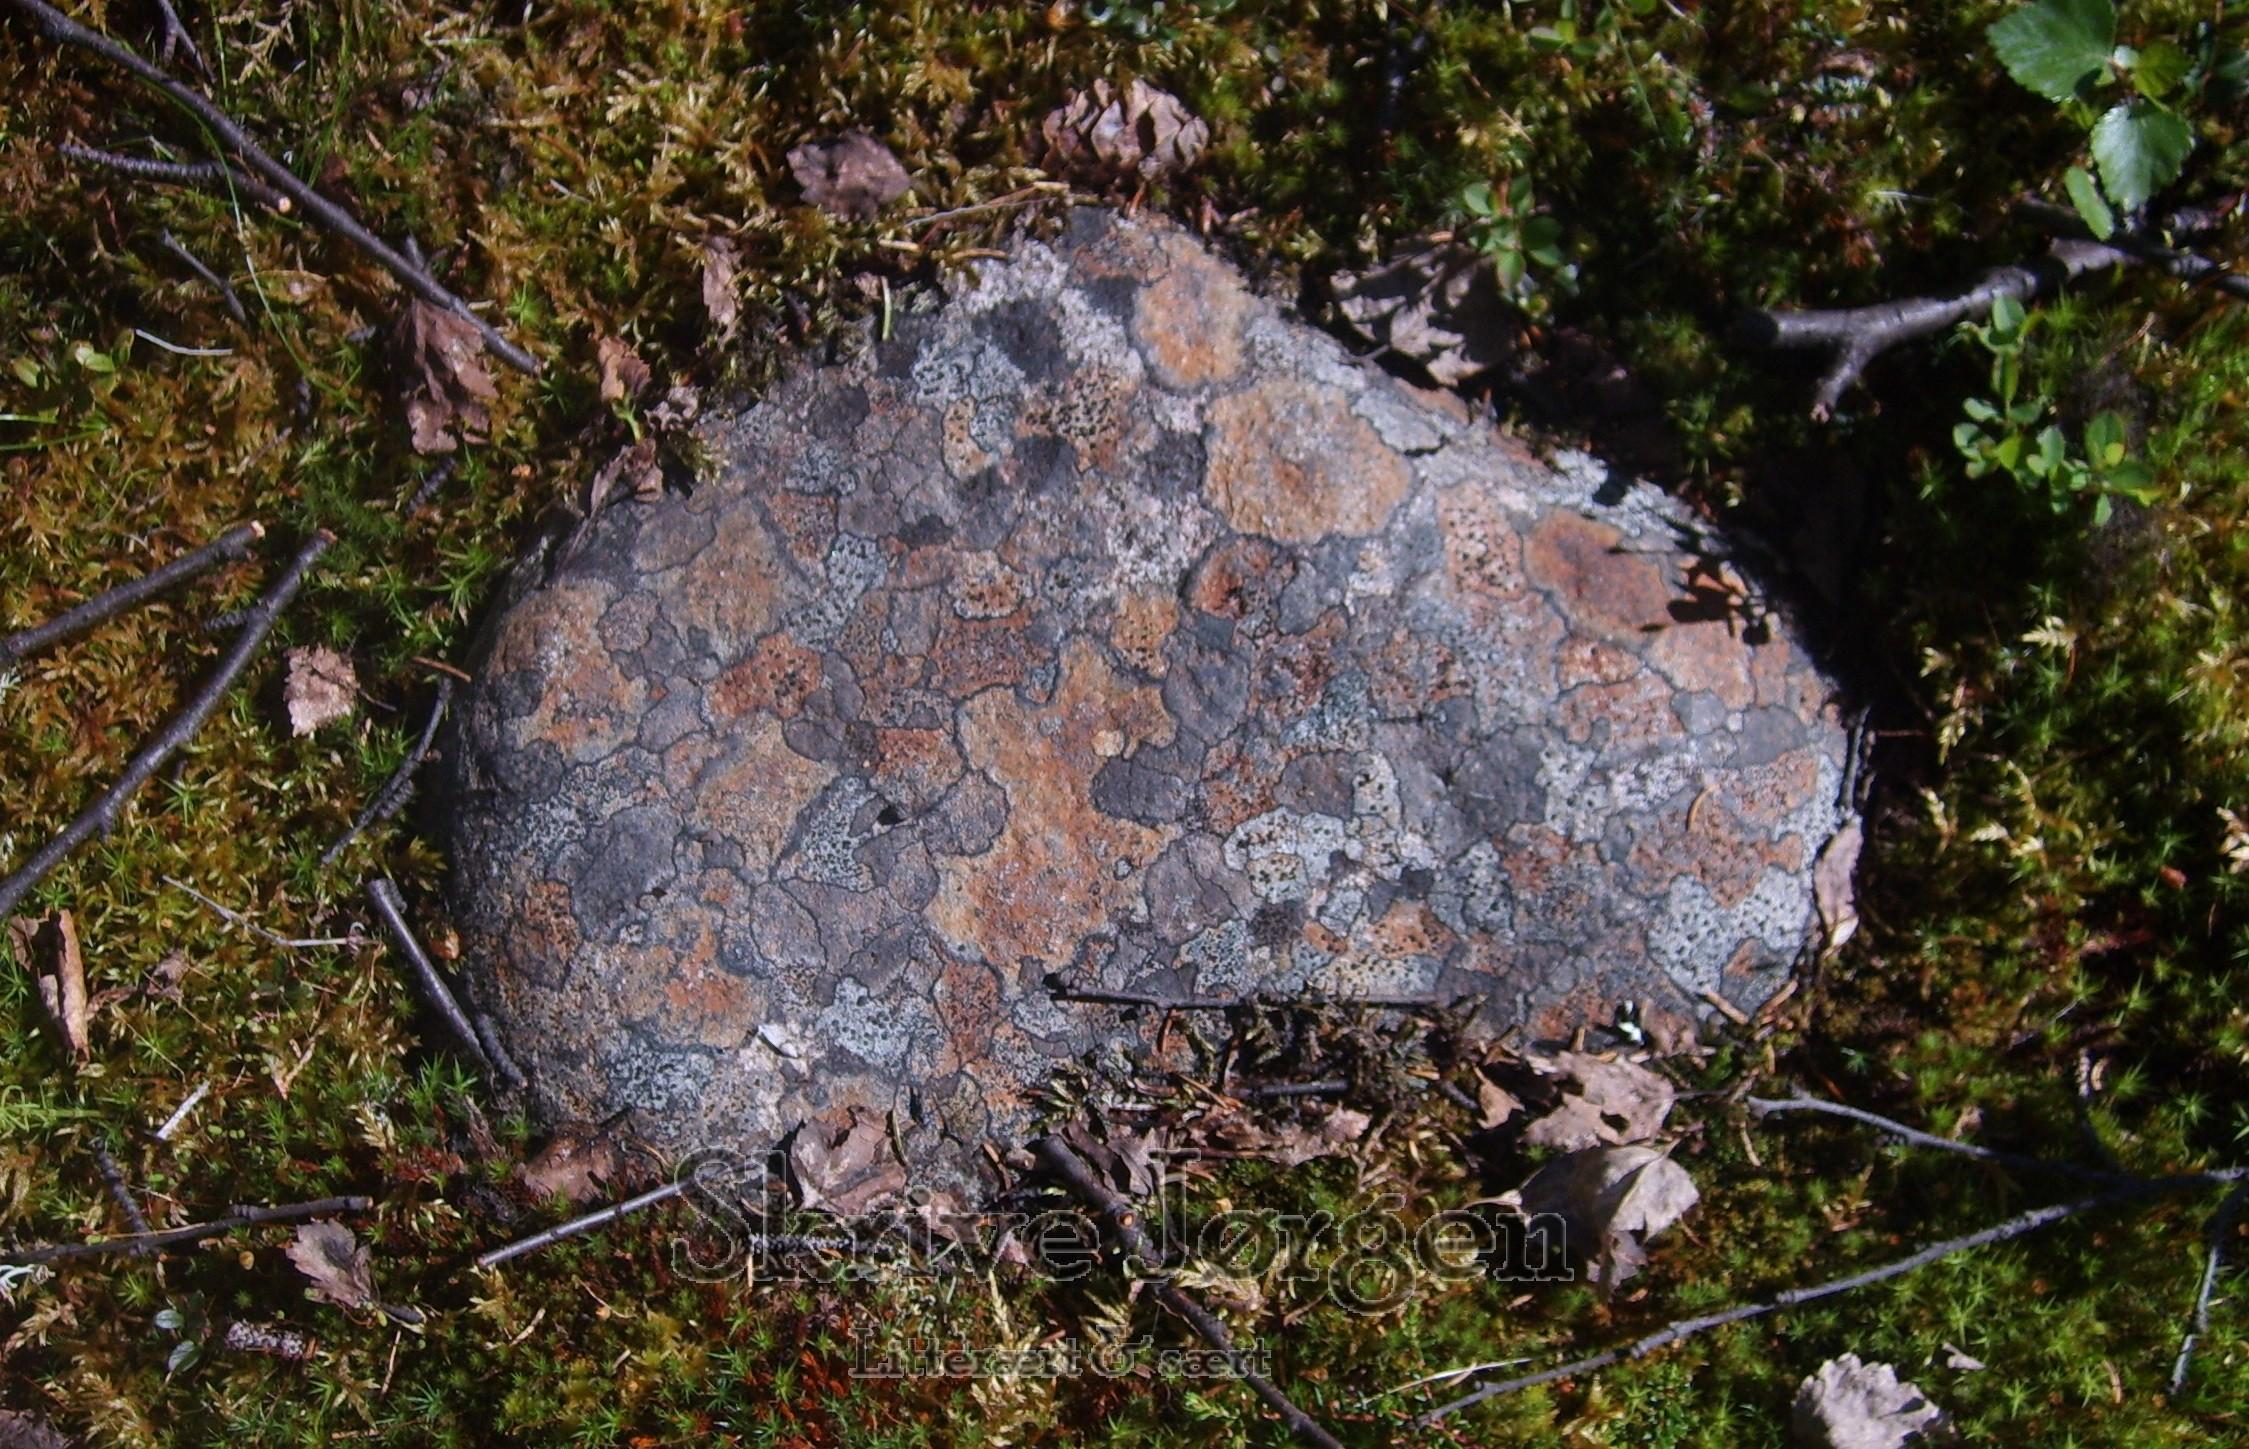 Fantastiske farver på en sten